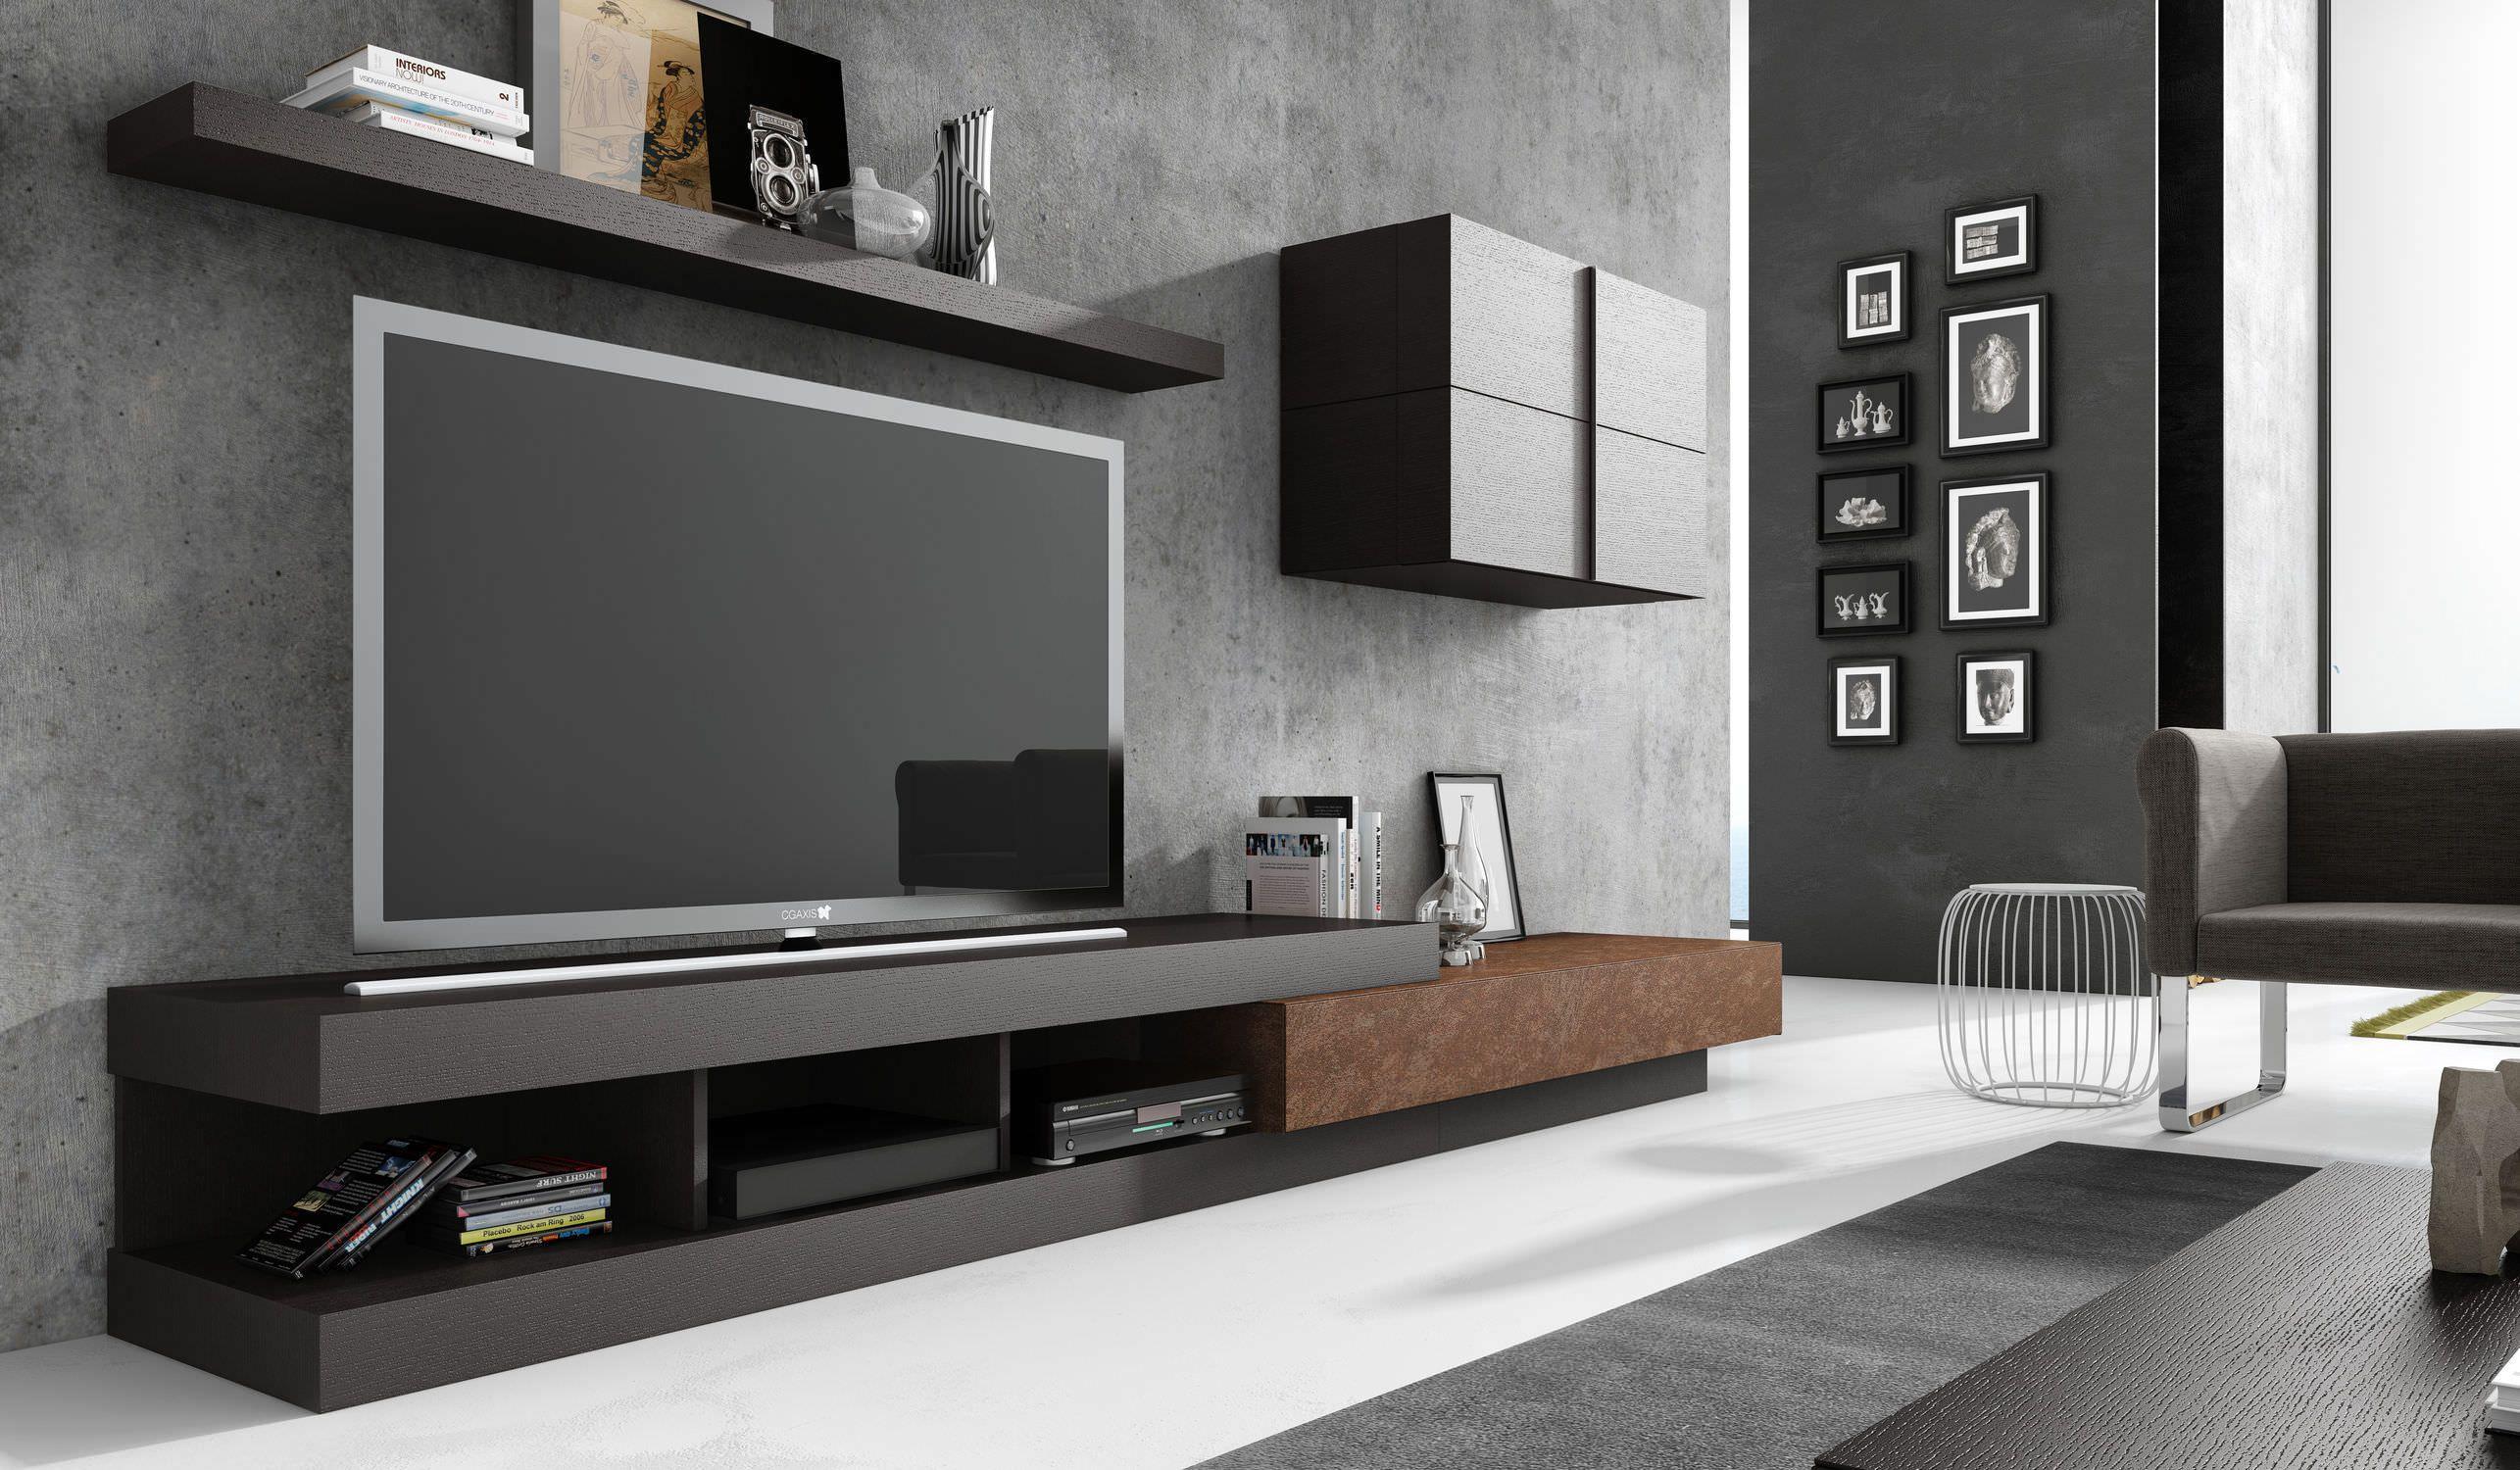 inspirant meuble tv contemporain design